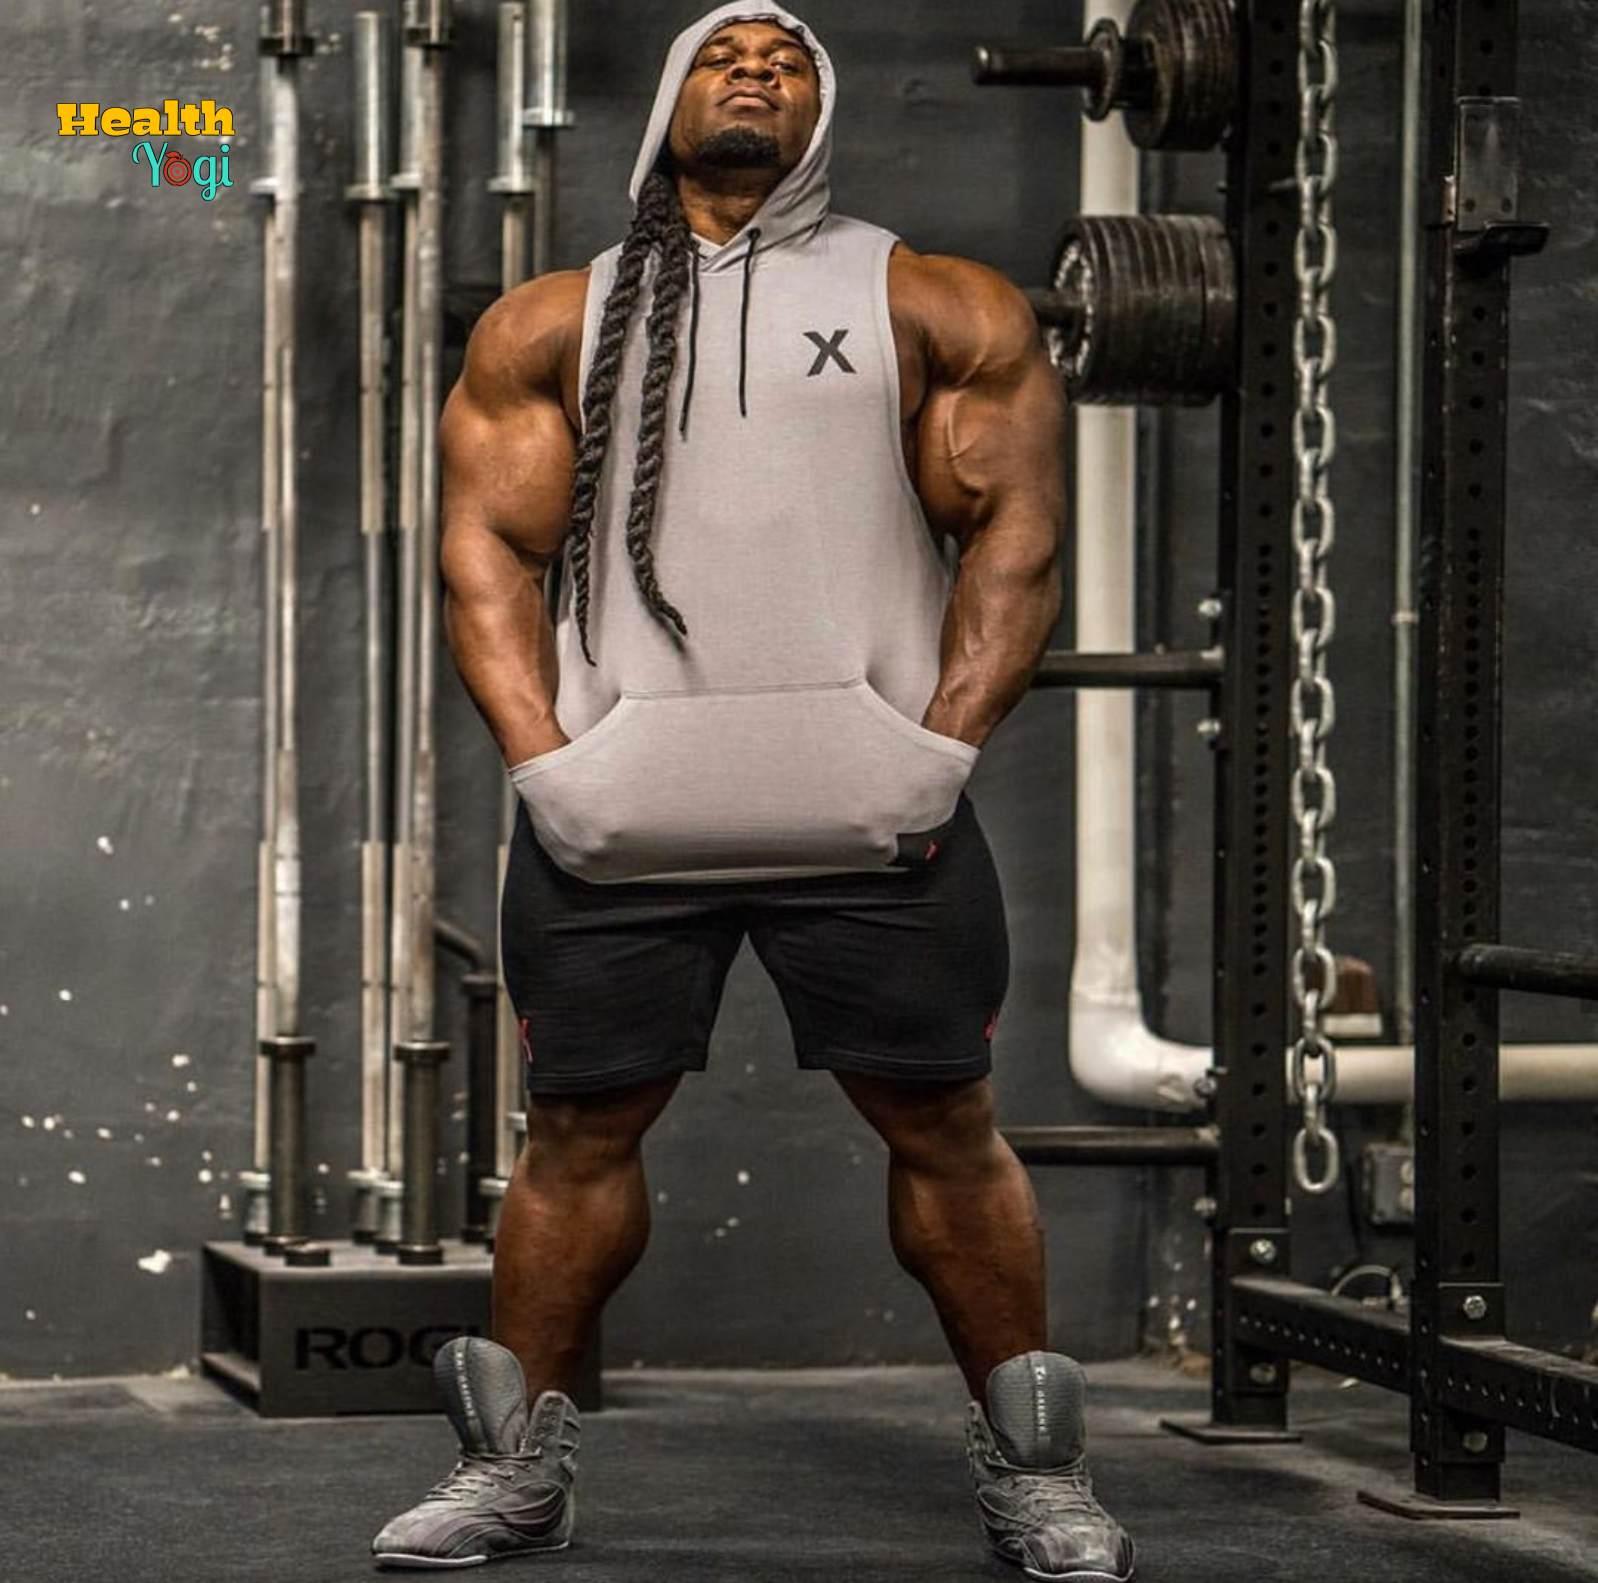 Kai Greene Workout Diet Age Height Body Stats Workout Video And Instagram Photos 2019 Health Yogi